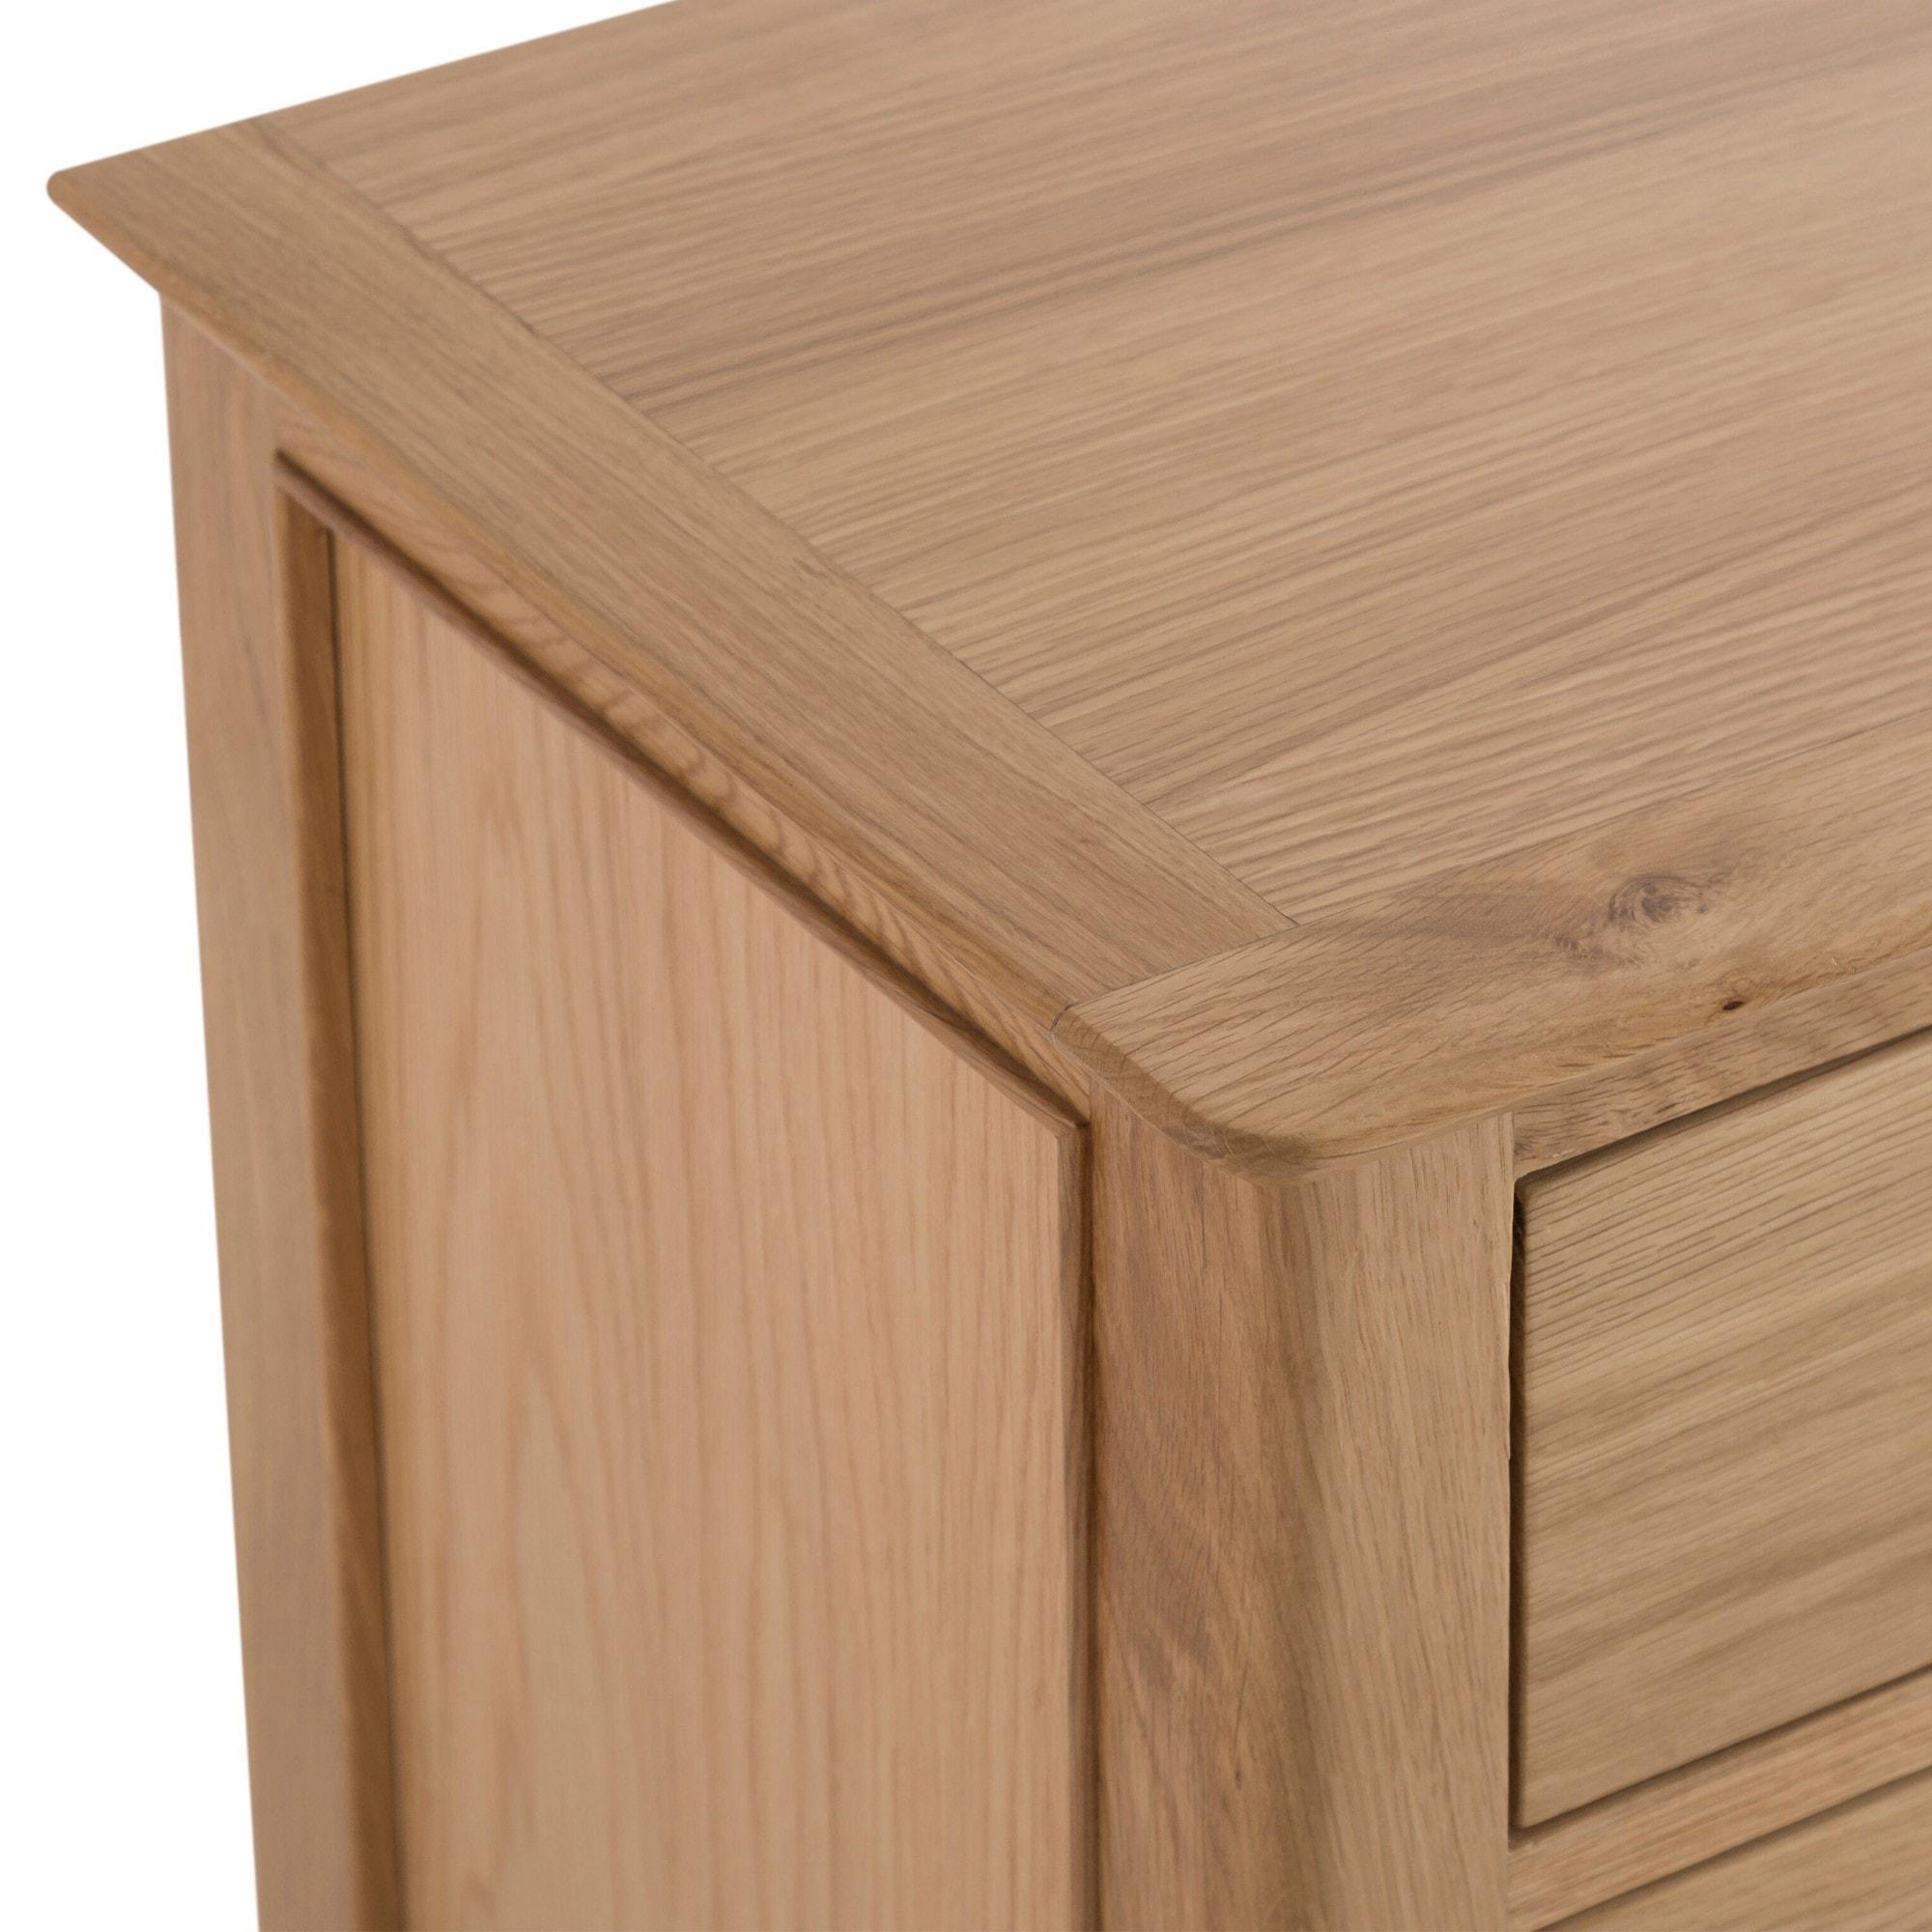 Picture of: Marfa Extra Large Bedside Cabinet Bedsides Wooden Bedsides